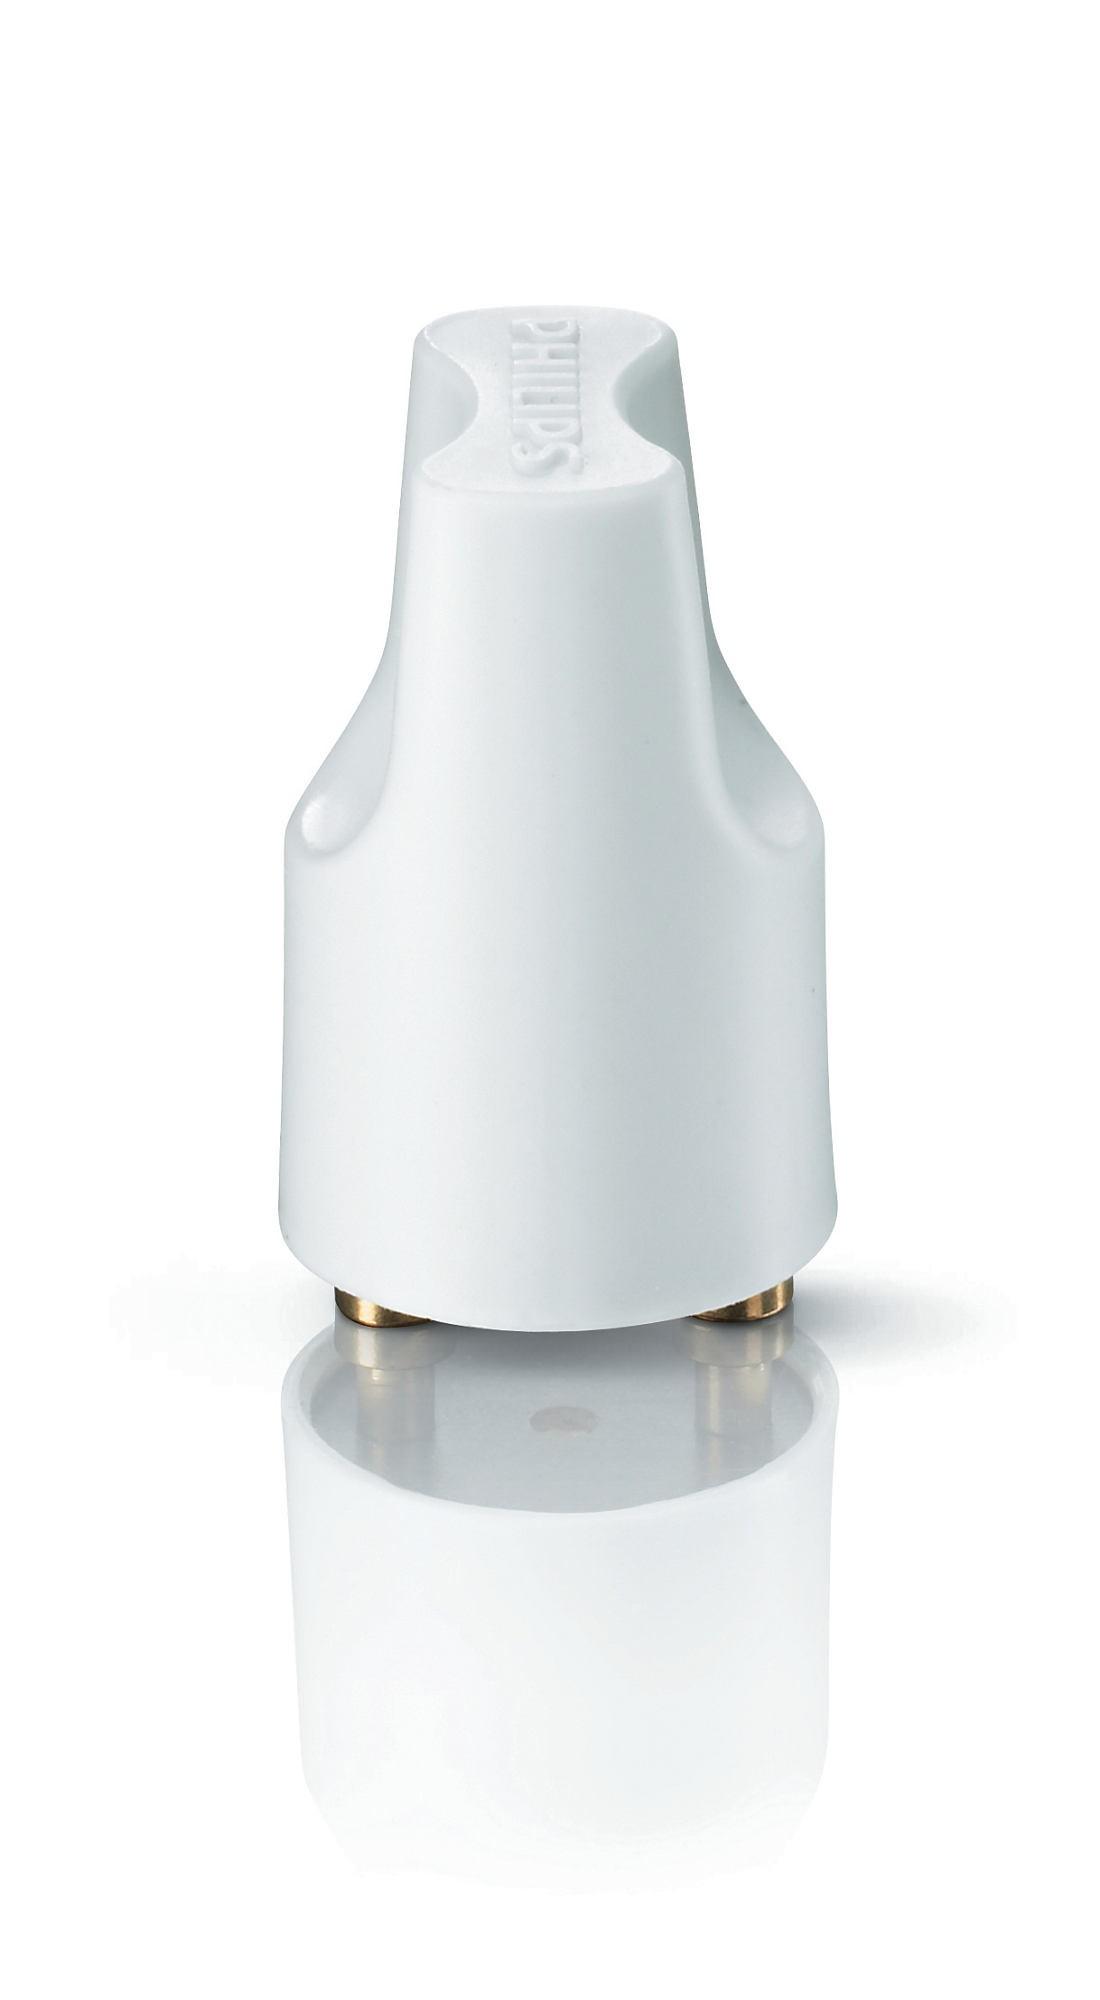 Lighting building solutions hotpoint philips master led tube starter emp 99902 arubaitofo Choice Image